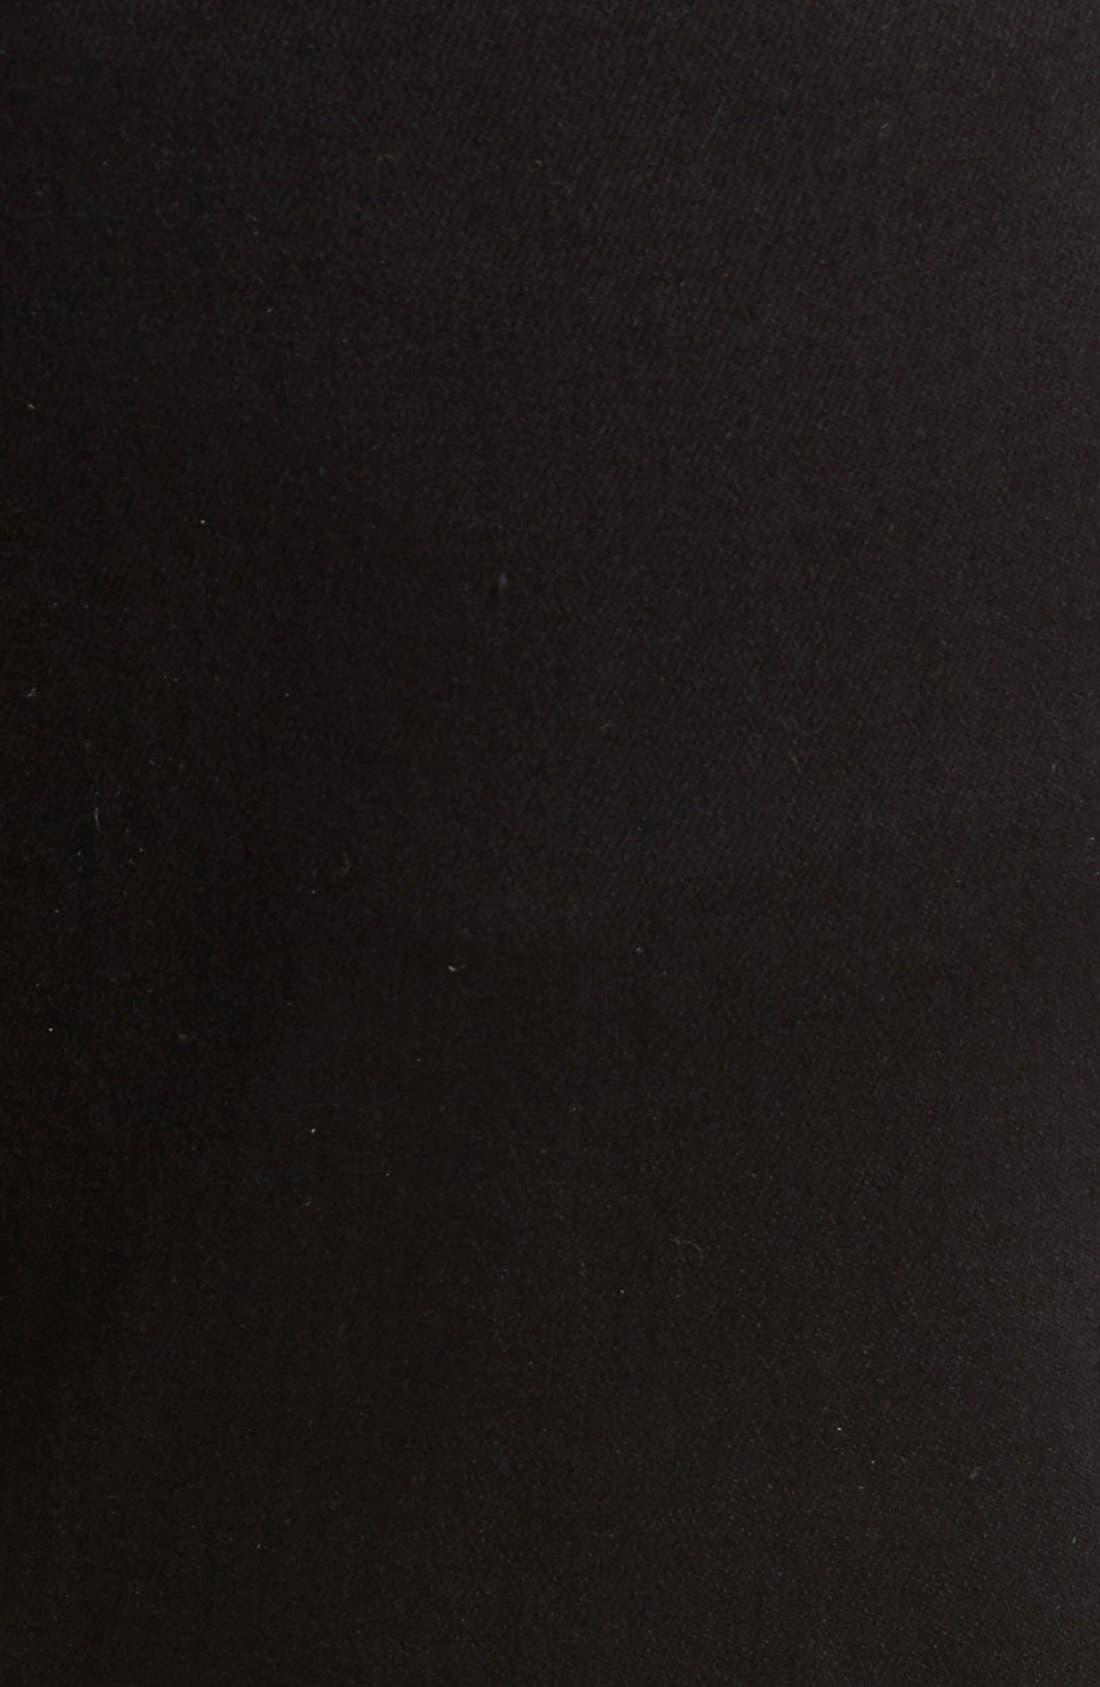 Tyler Slim Fit Jeans,                             Alternate thumbnail 5, color,                             Trivor Black